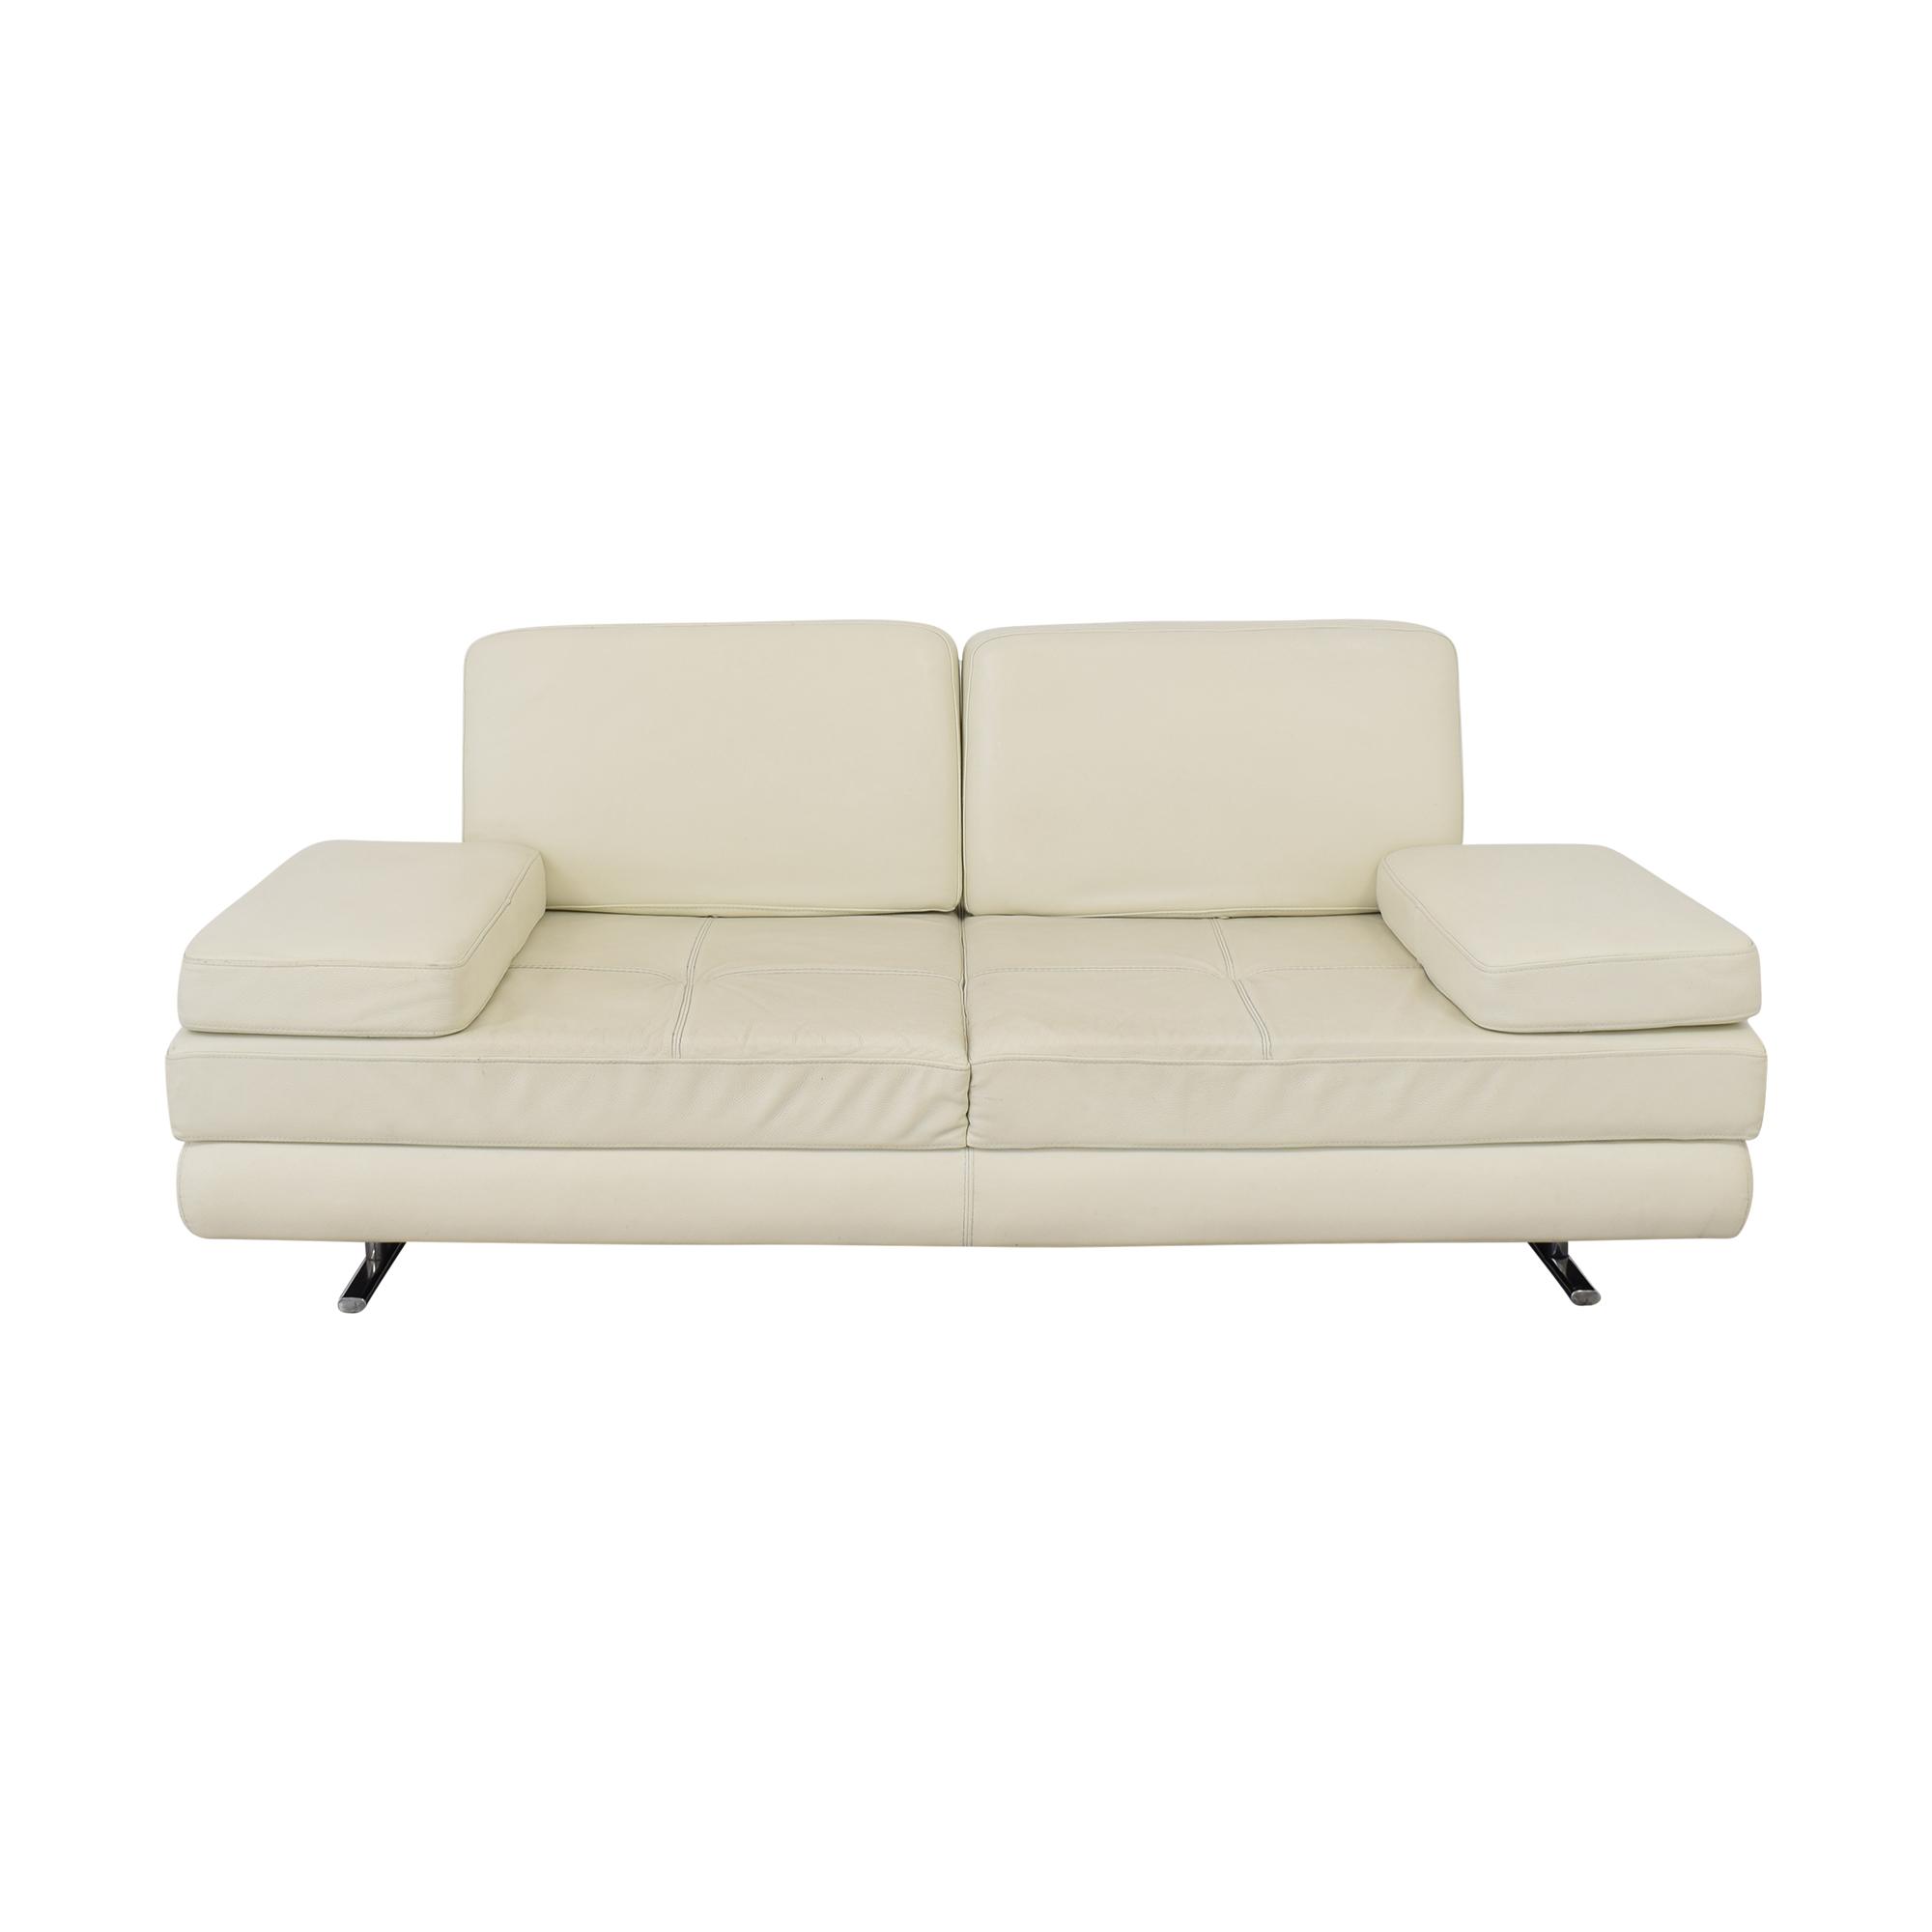 Lazzoni Lazzoni Mony Full Sleeper Sofa second hand